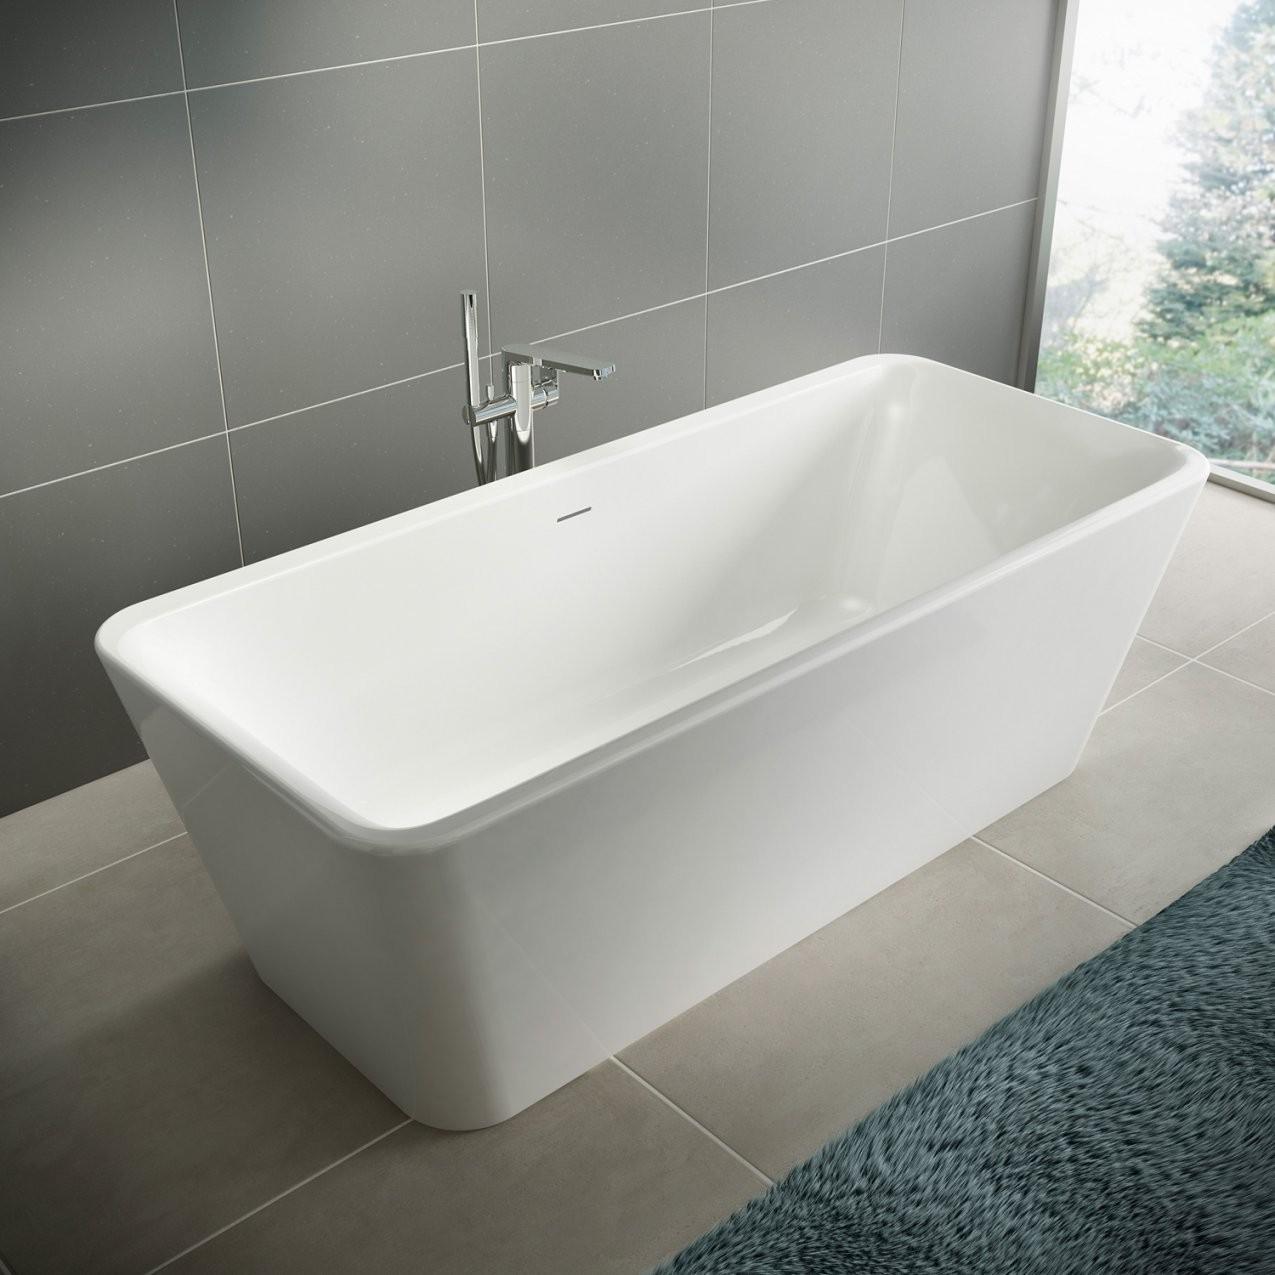 Ideal Standard Tonic Ii Badewanne Freistehend Badshop von Ideal Standard Freistehende Badewanne Bild